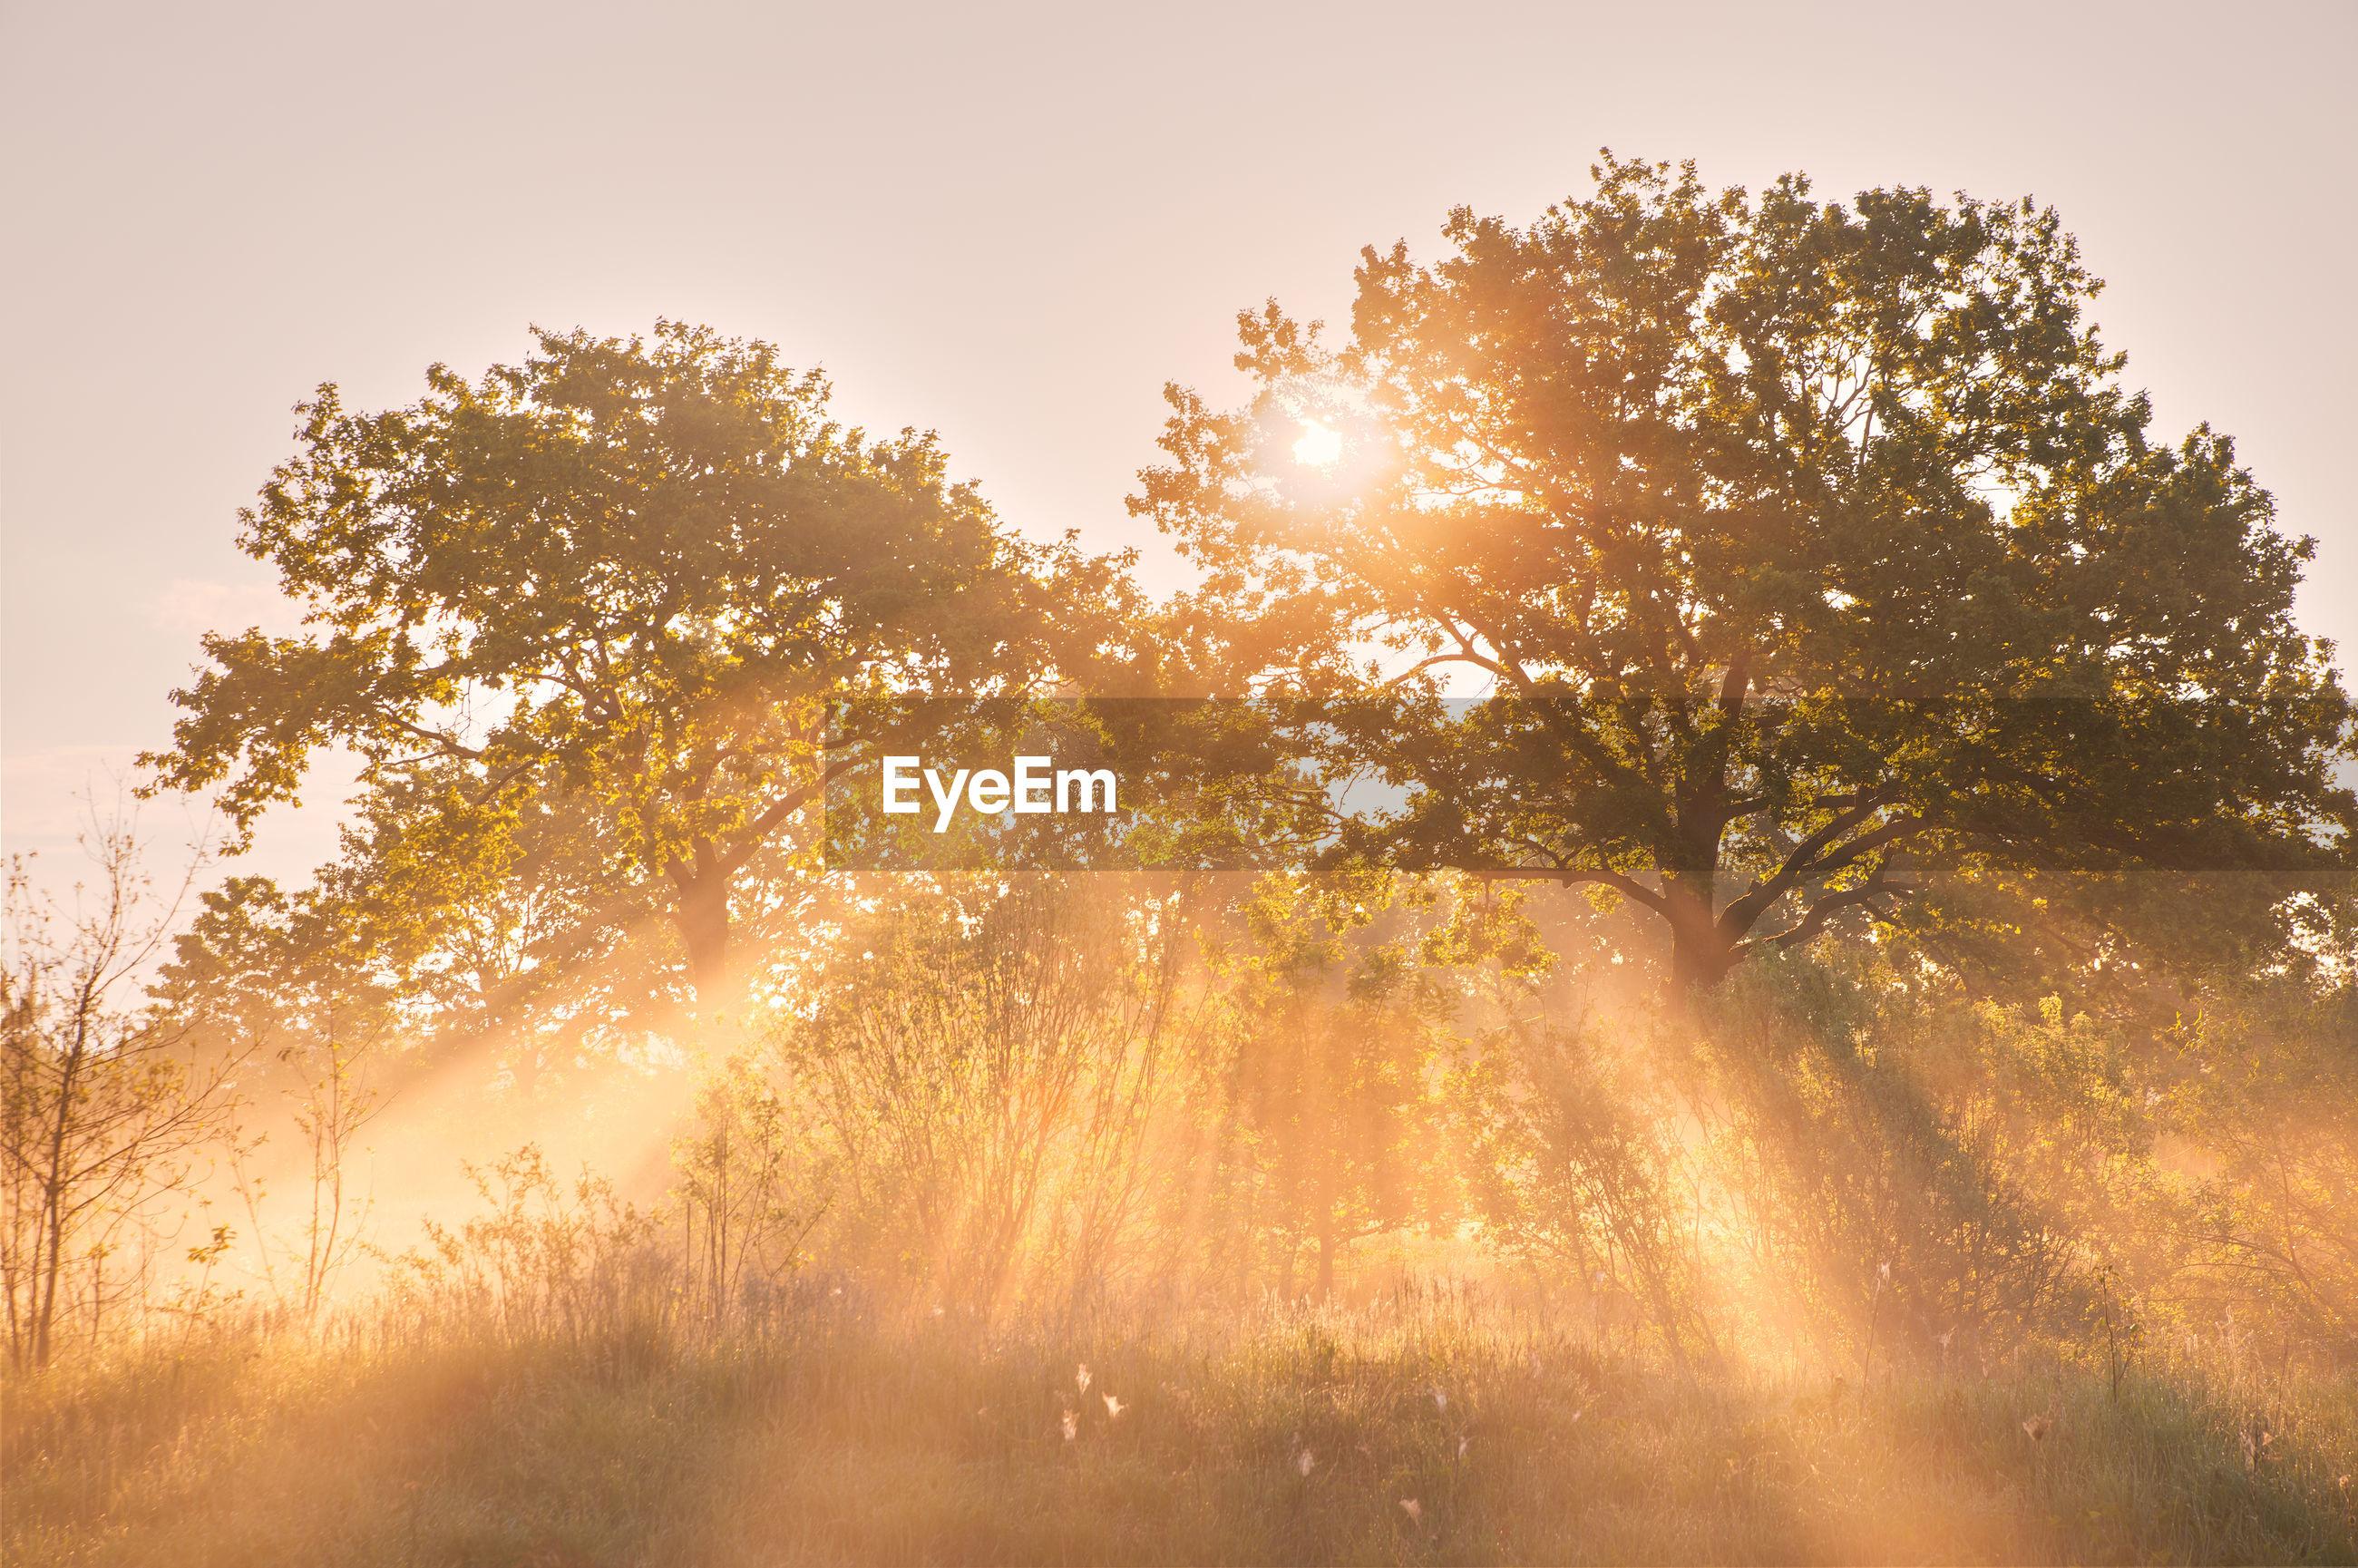 SUNLIGHT STREAMING THROUGH TREE ON FIELD